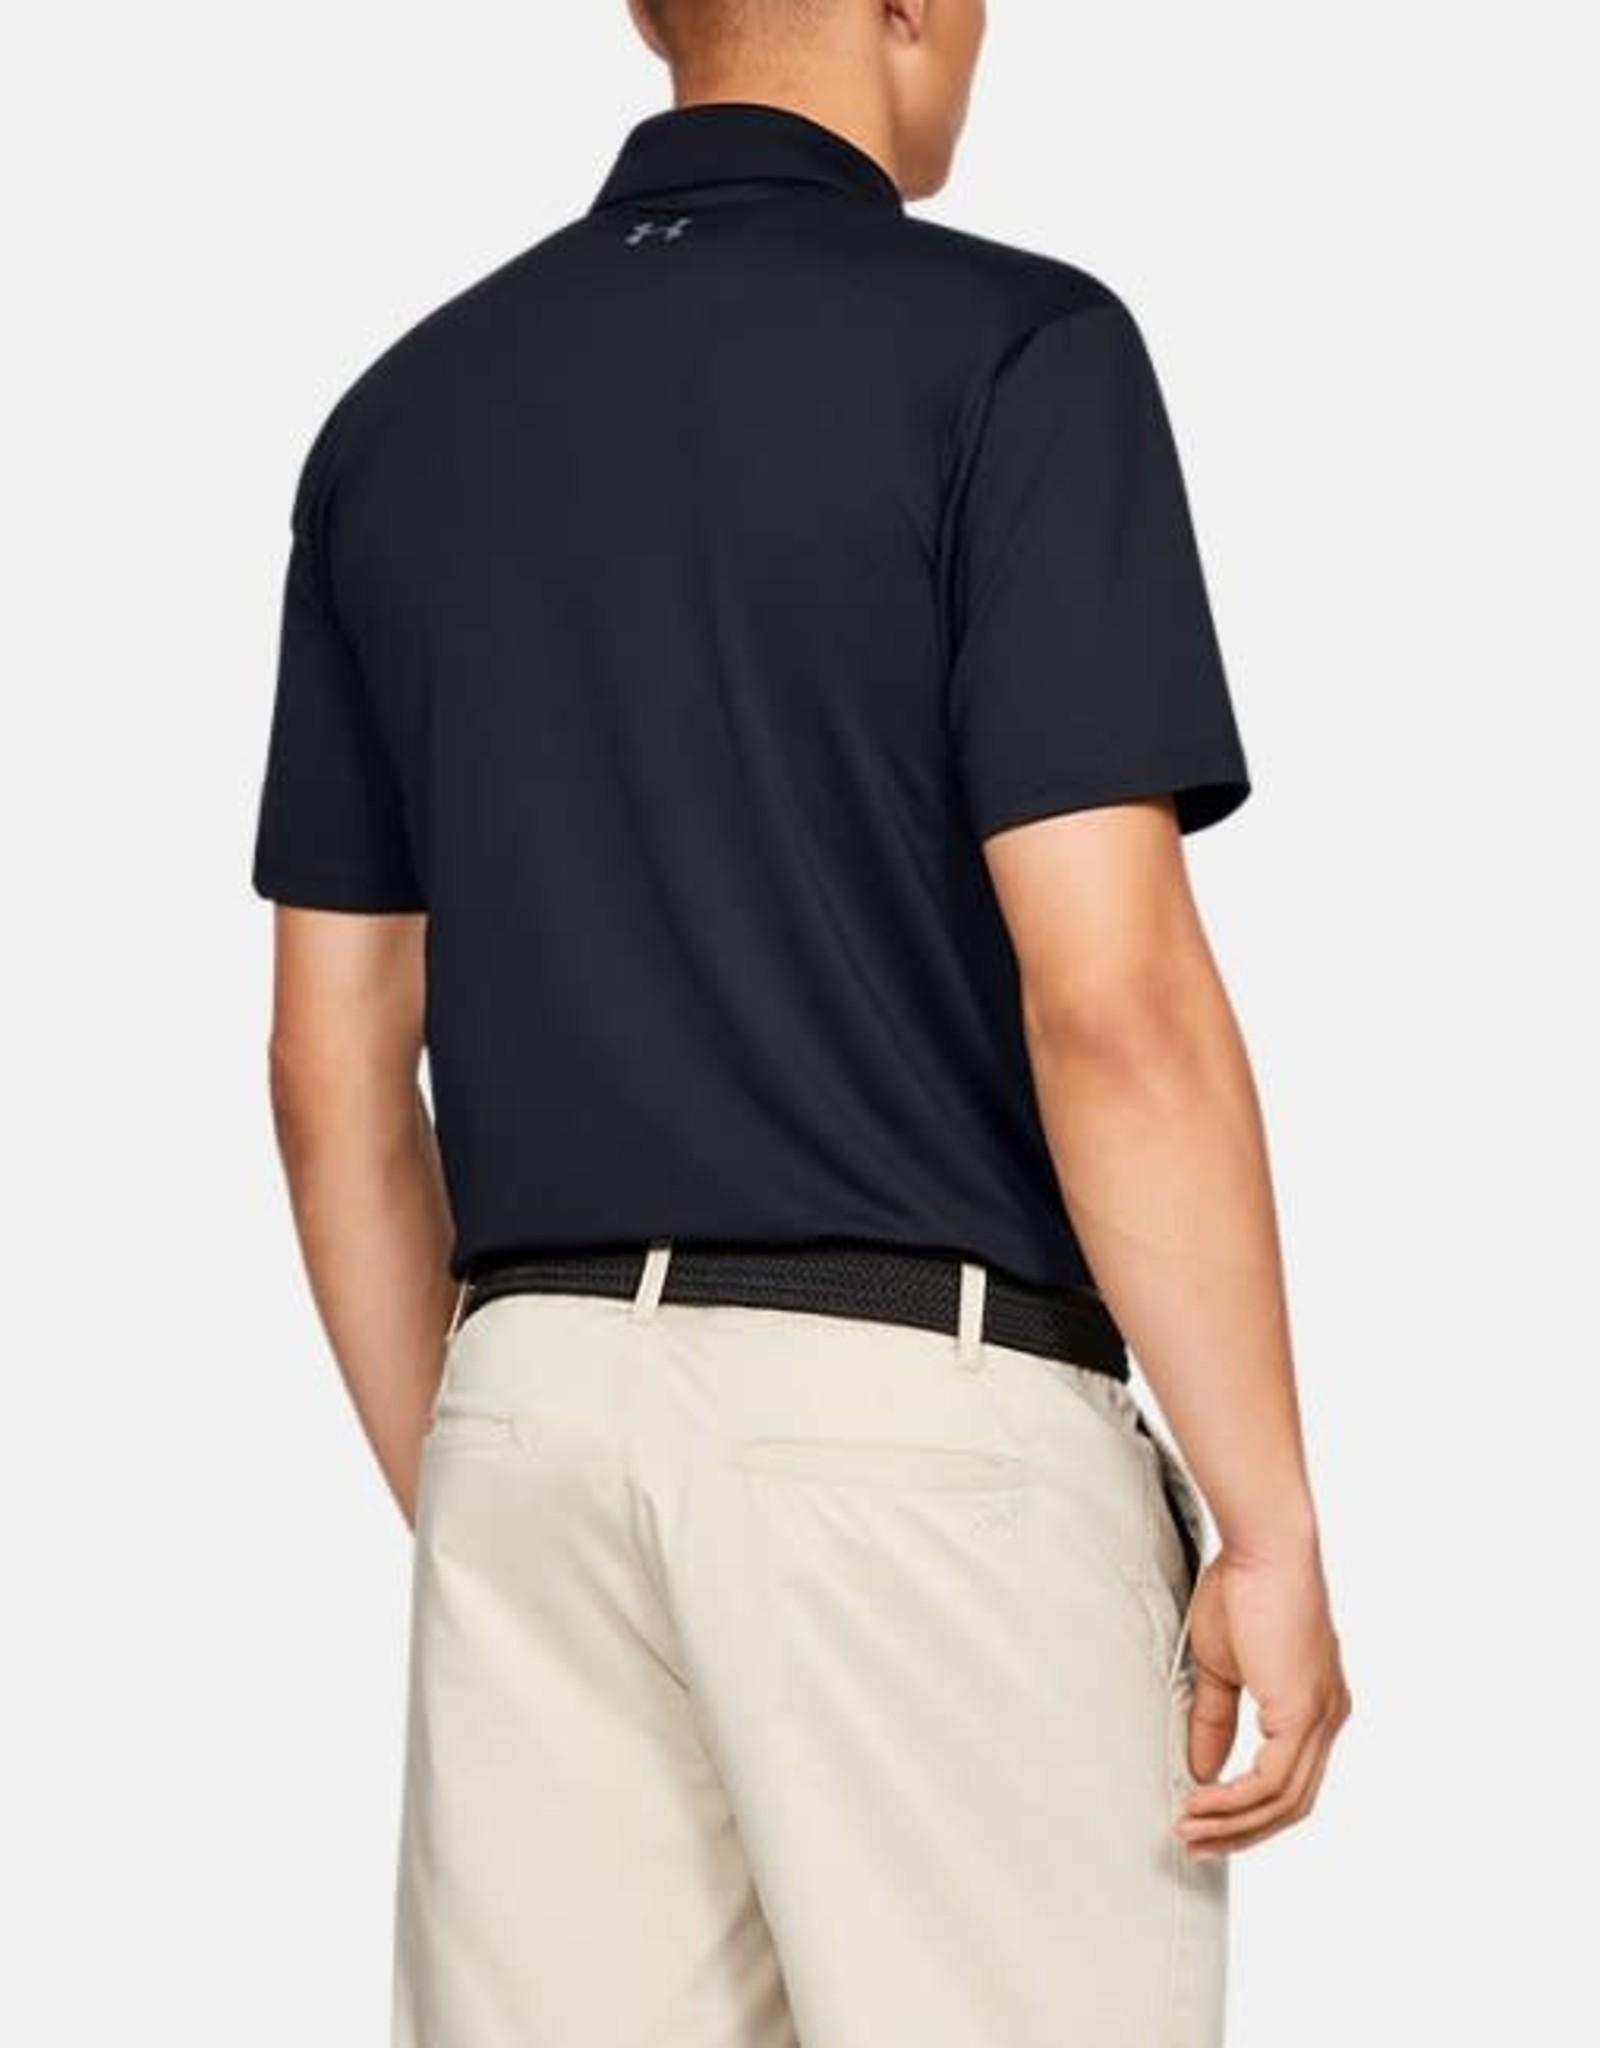 Under Armour Golf Performance 2.0 Polo - black